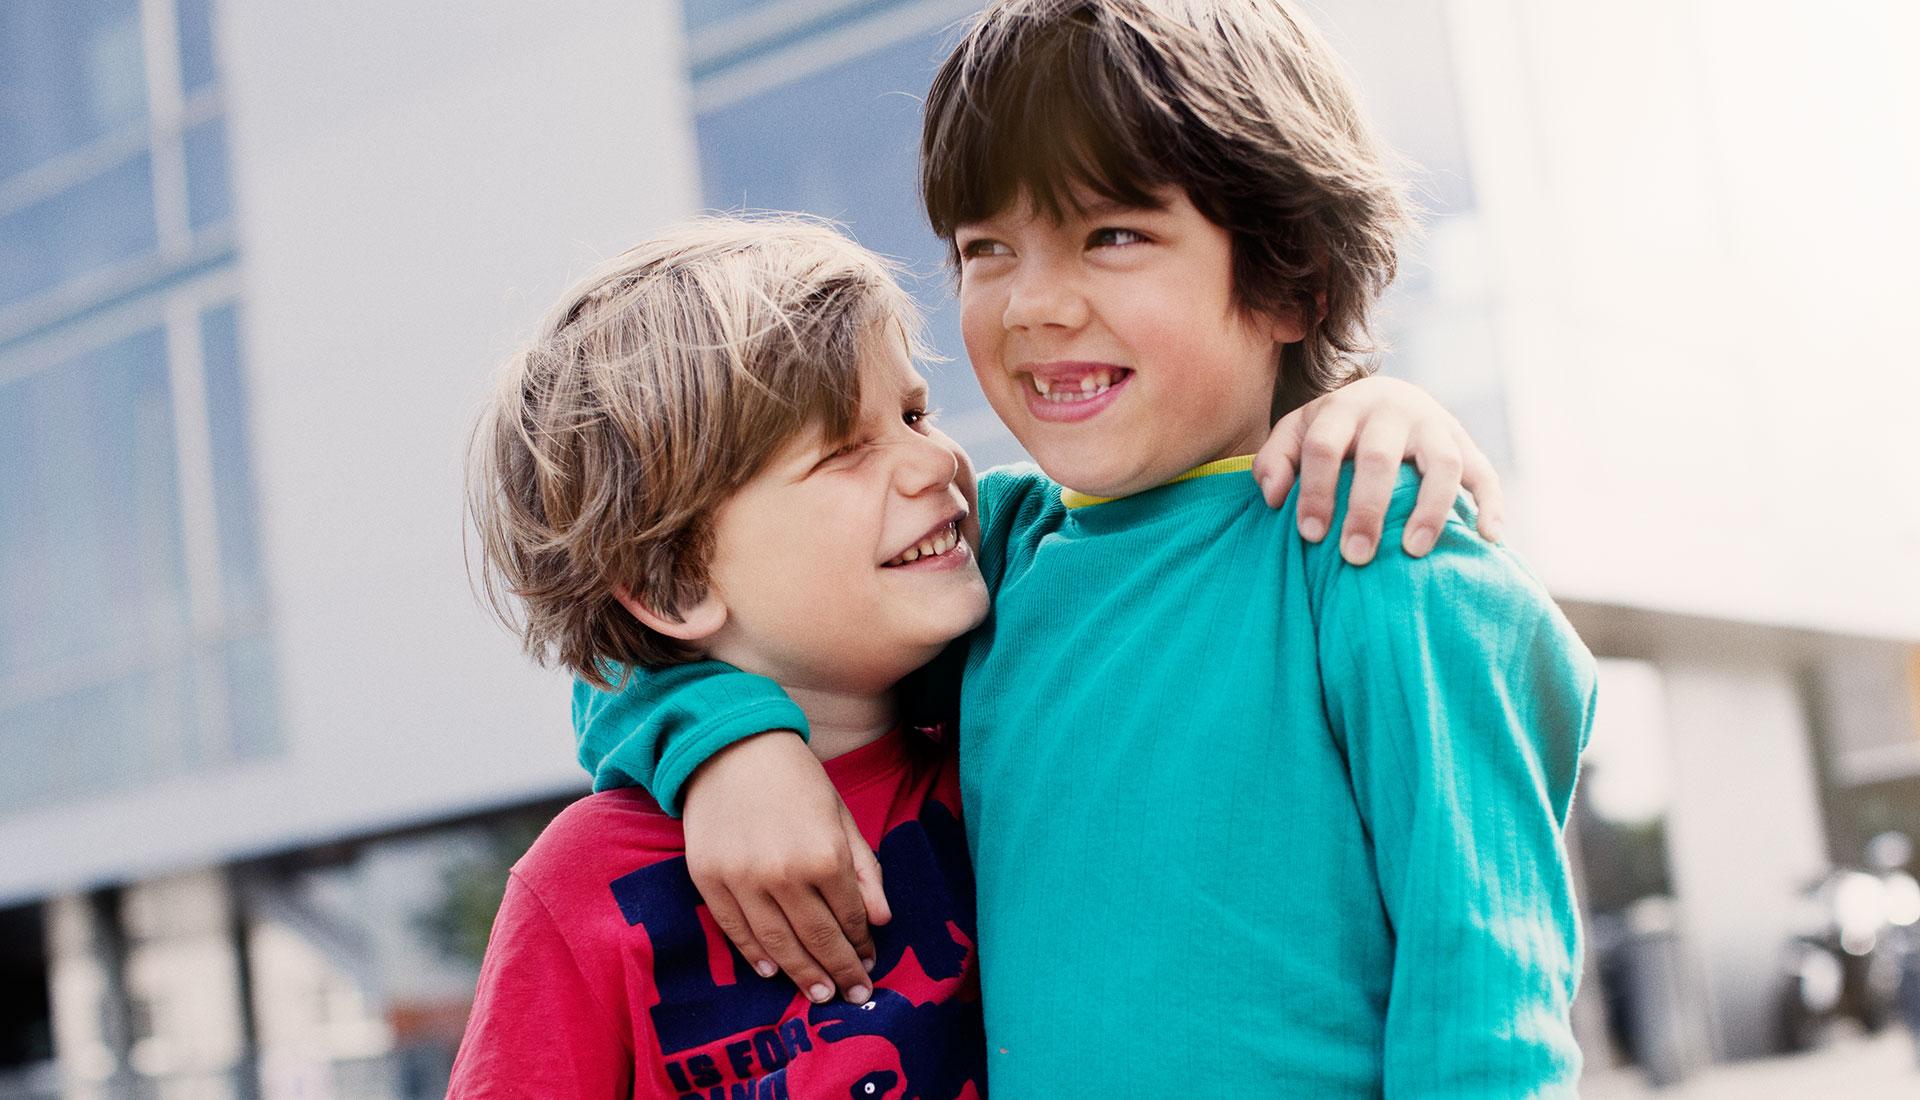 deux garçons très proches câlin